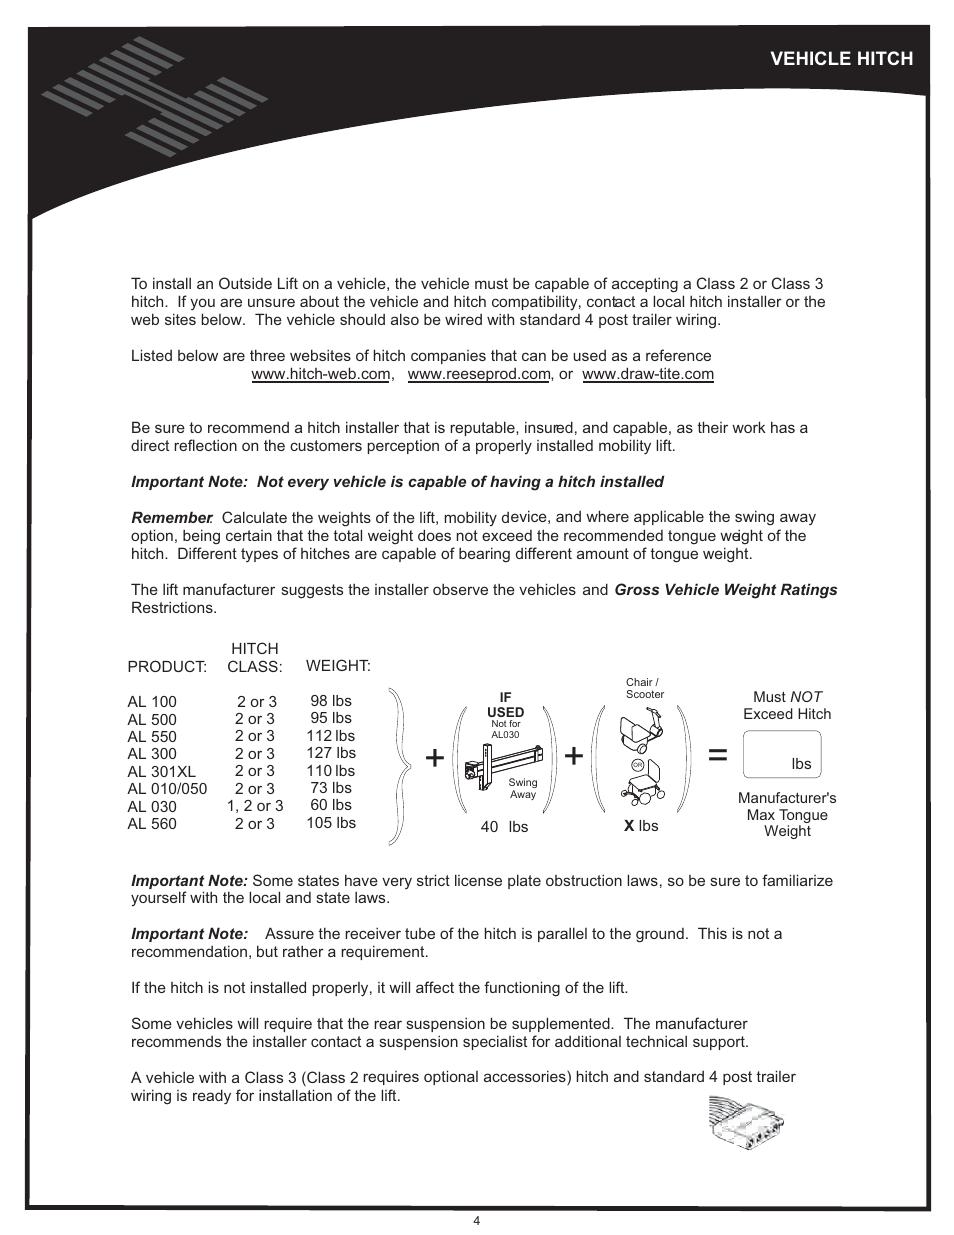 Vehicle hitch   Harmar Mobility AL500 User Manual   Page 4 / 36 on harmar al600 wiring harness, polaris sportsman 500 wiring diagram, harmar dealer locator, harmar al600 manual, harmar mobility dealers, electric bike controller wiring diagram, pride scooter wiring diagram,